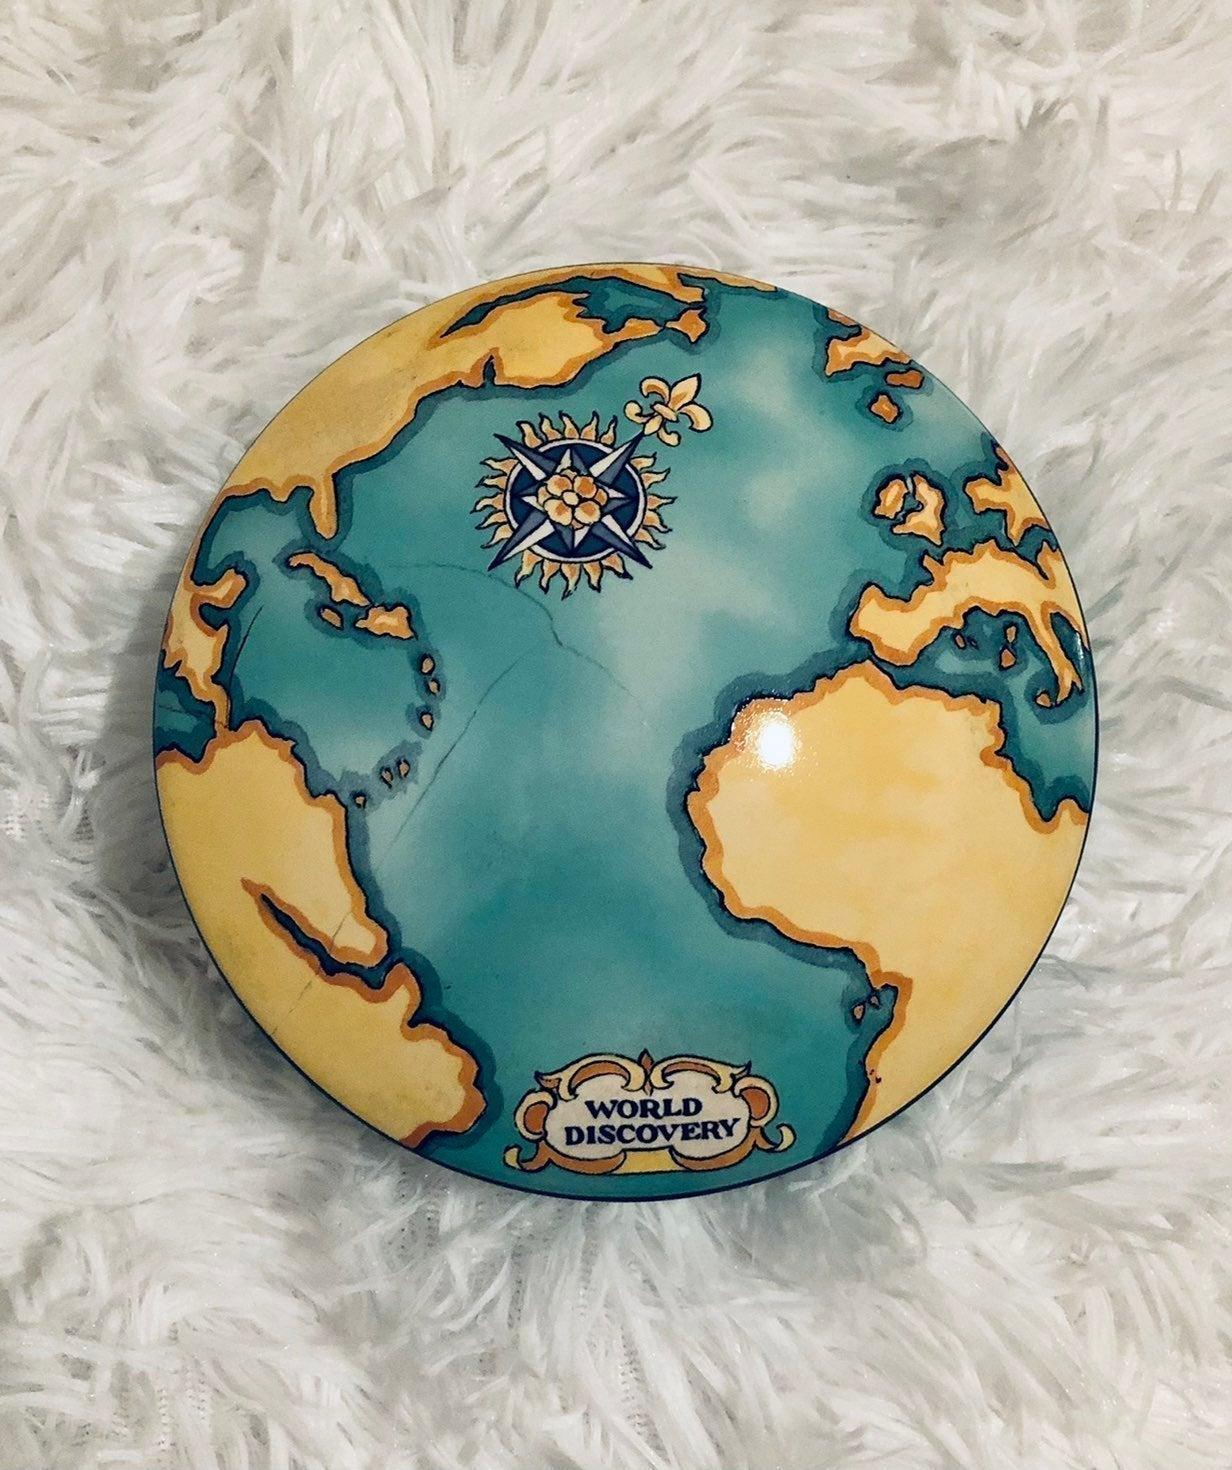 Tiffany & Co. Tauck Porcelain Box